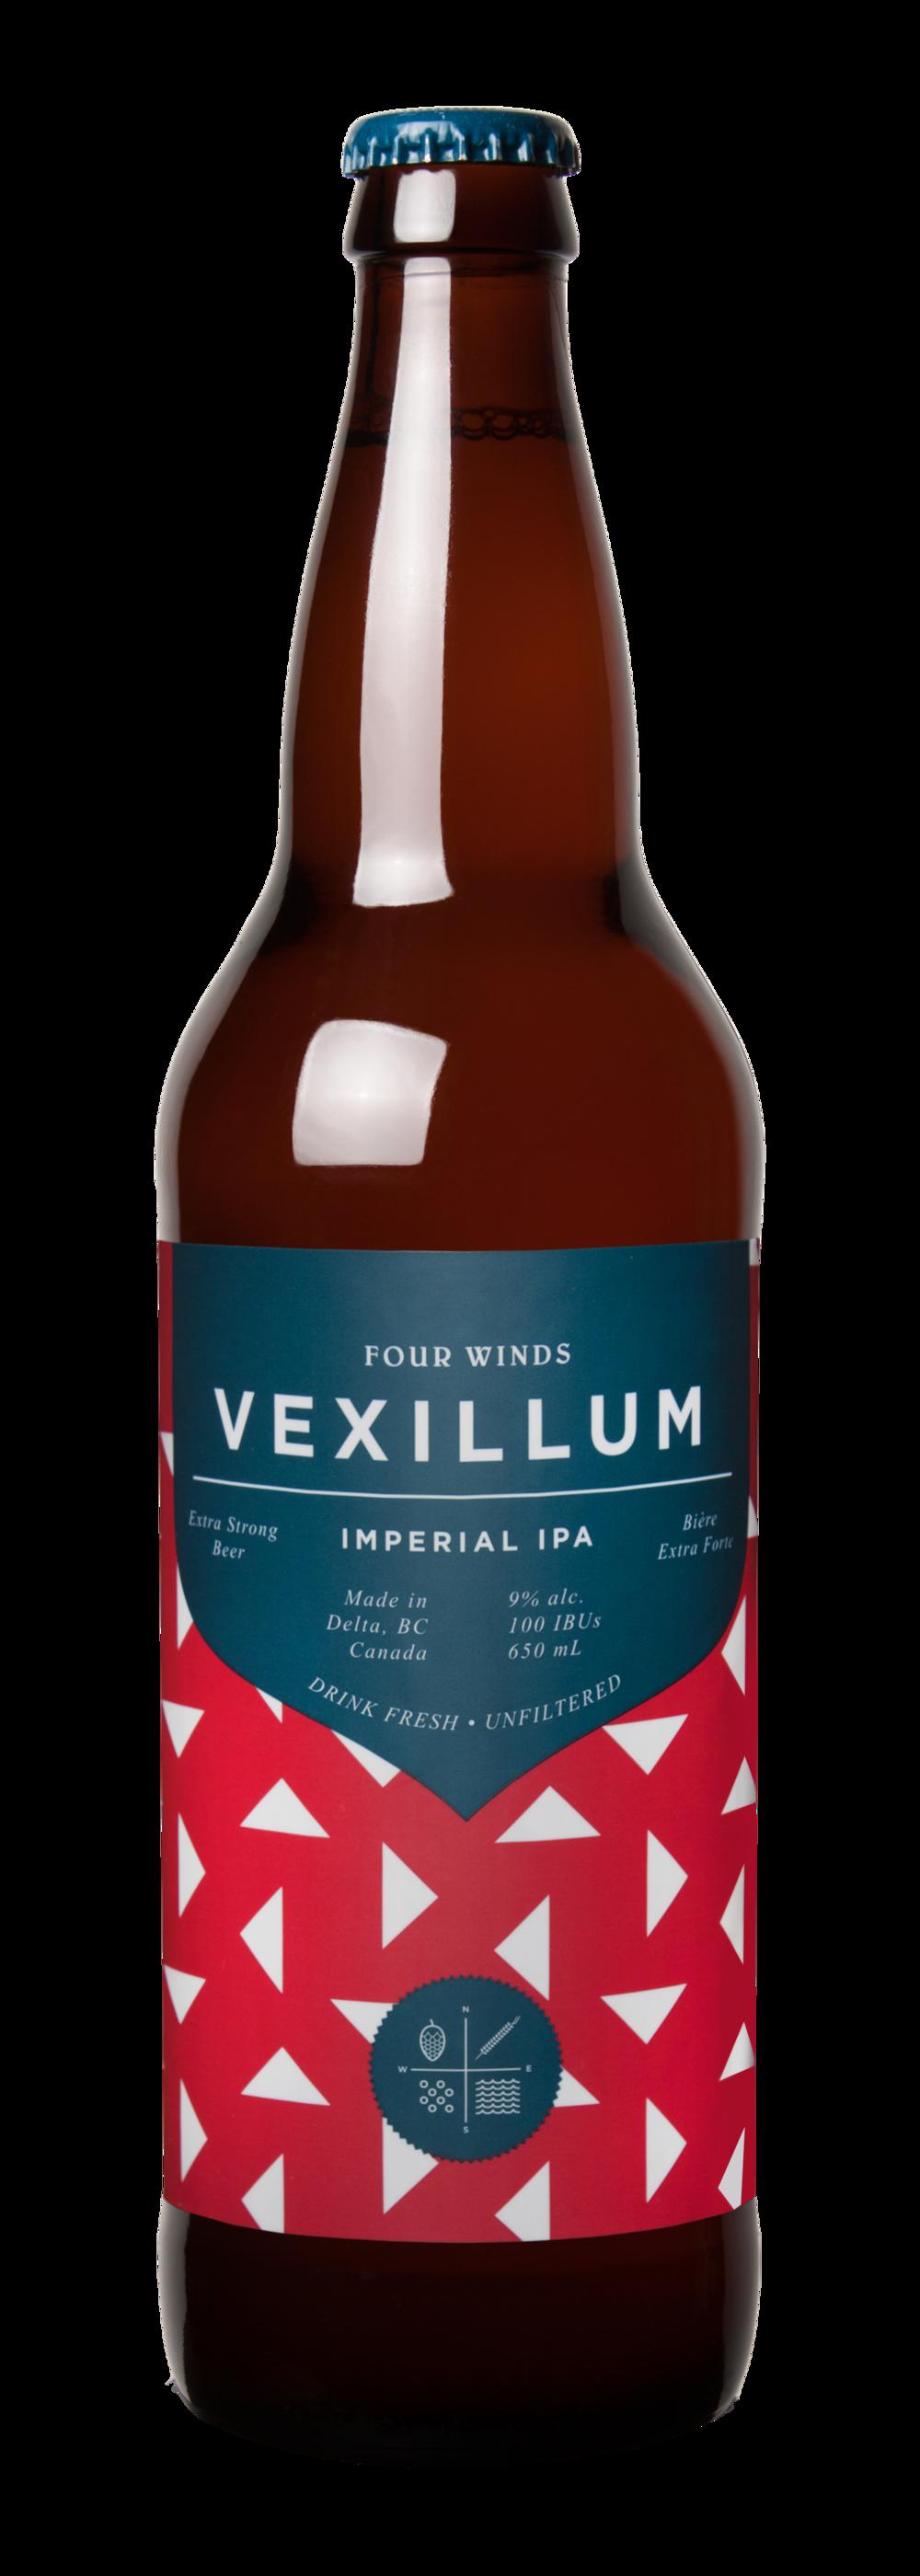 Imperial India Pale Ale — Northwest Beer Guide - Beer